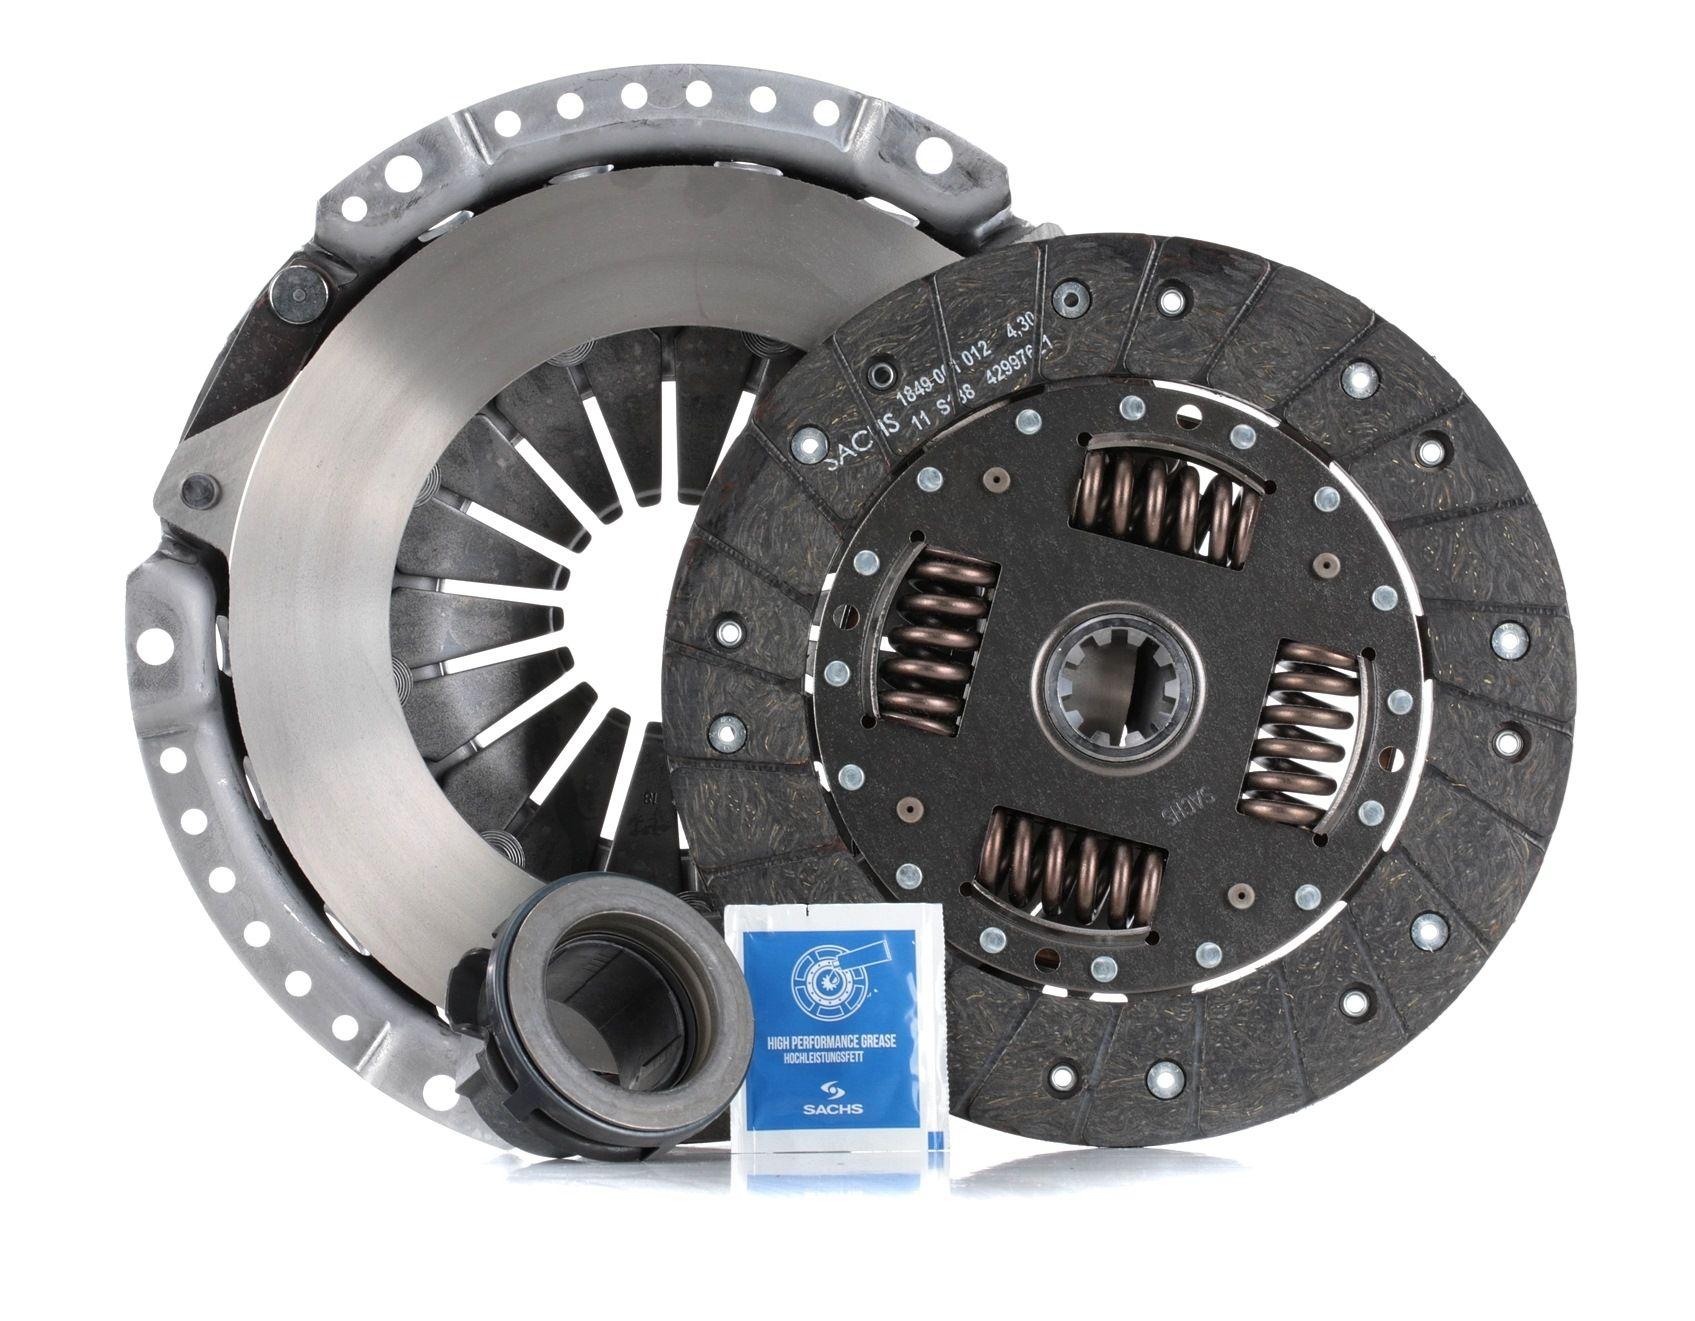 BMW 3 Series 2014 Clutch kit SACHS 3000 950 058: